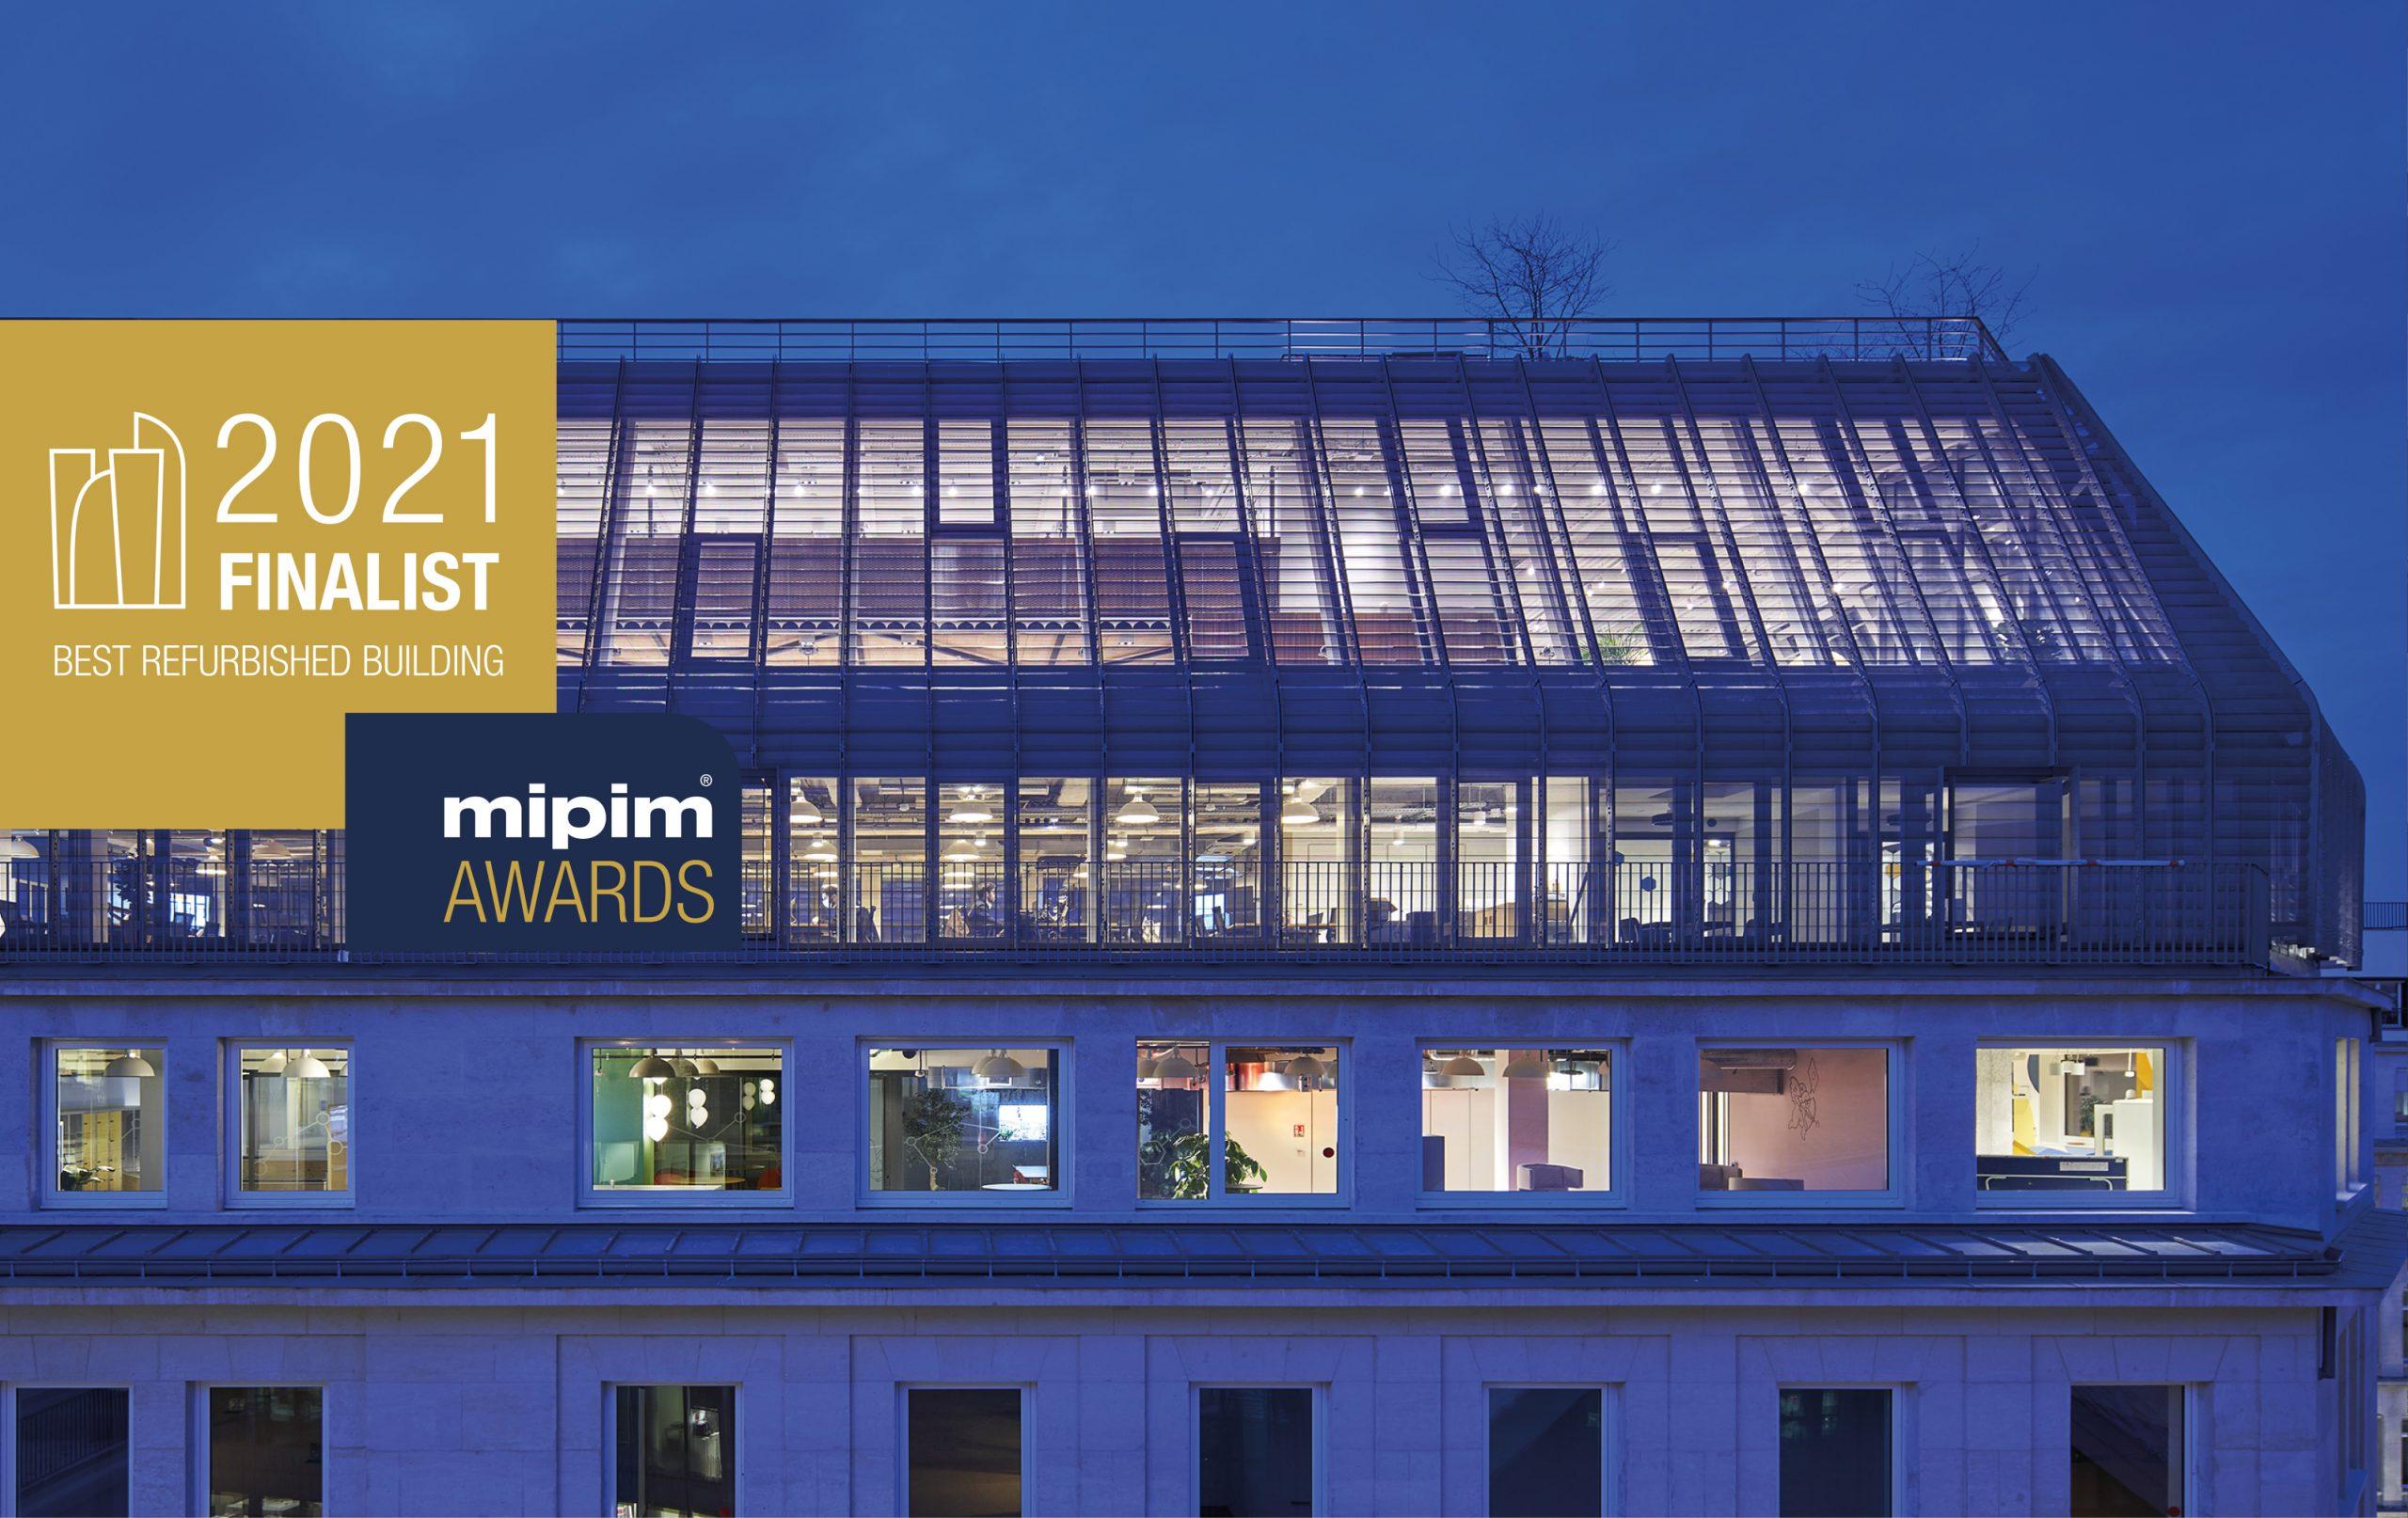 7 Madrid Finaliste MIPIM Awards 2021